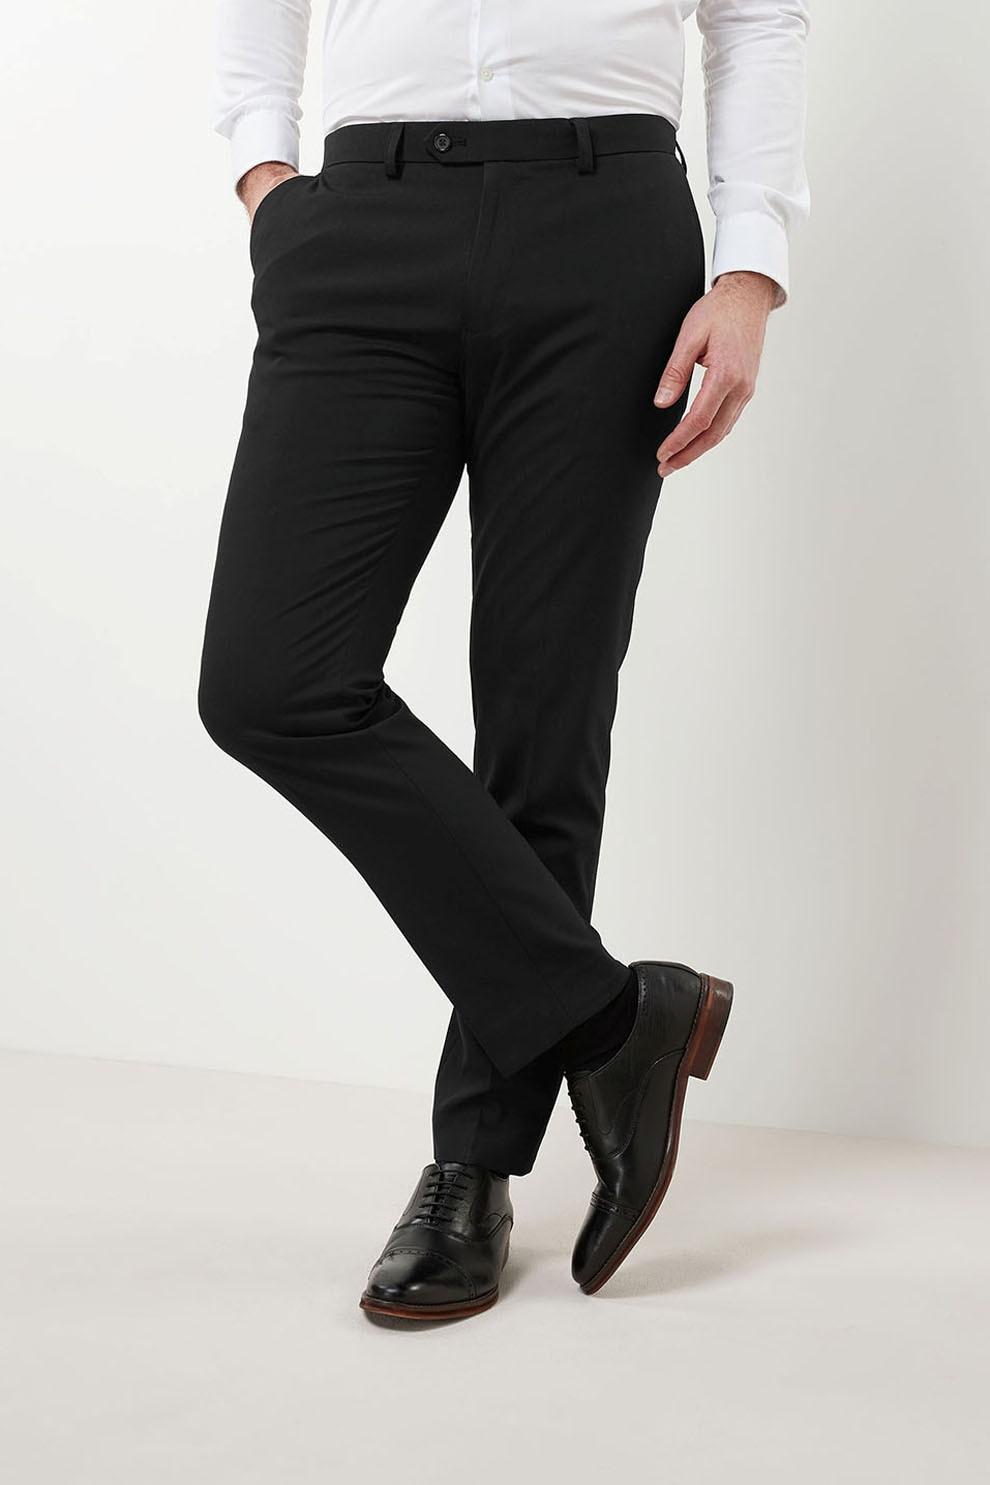 fekete alkalmi nadrág férfi